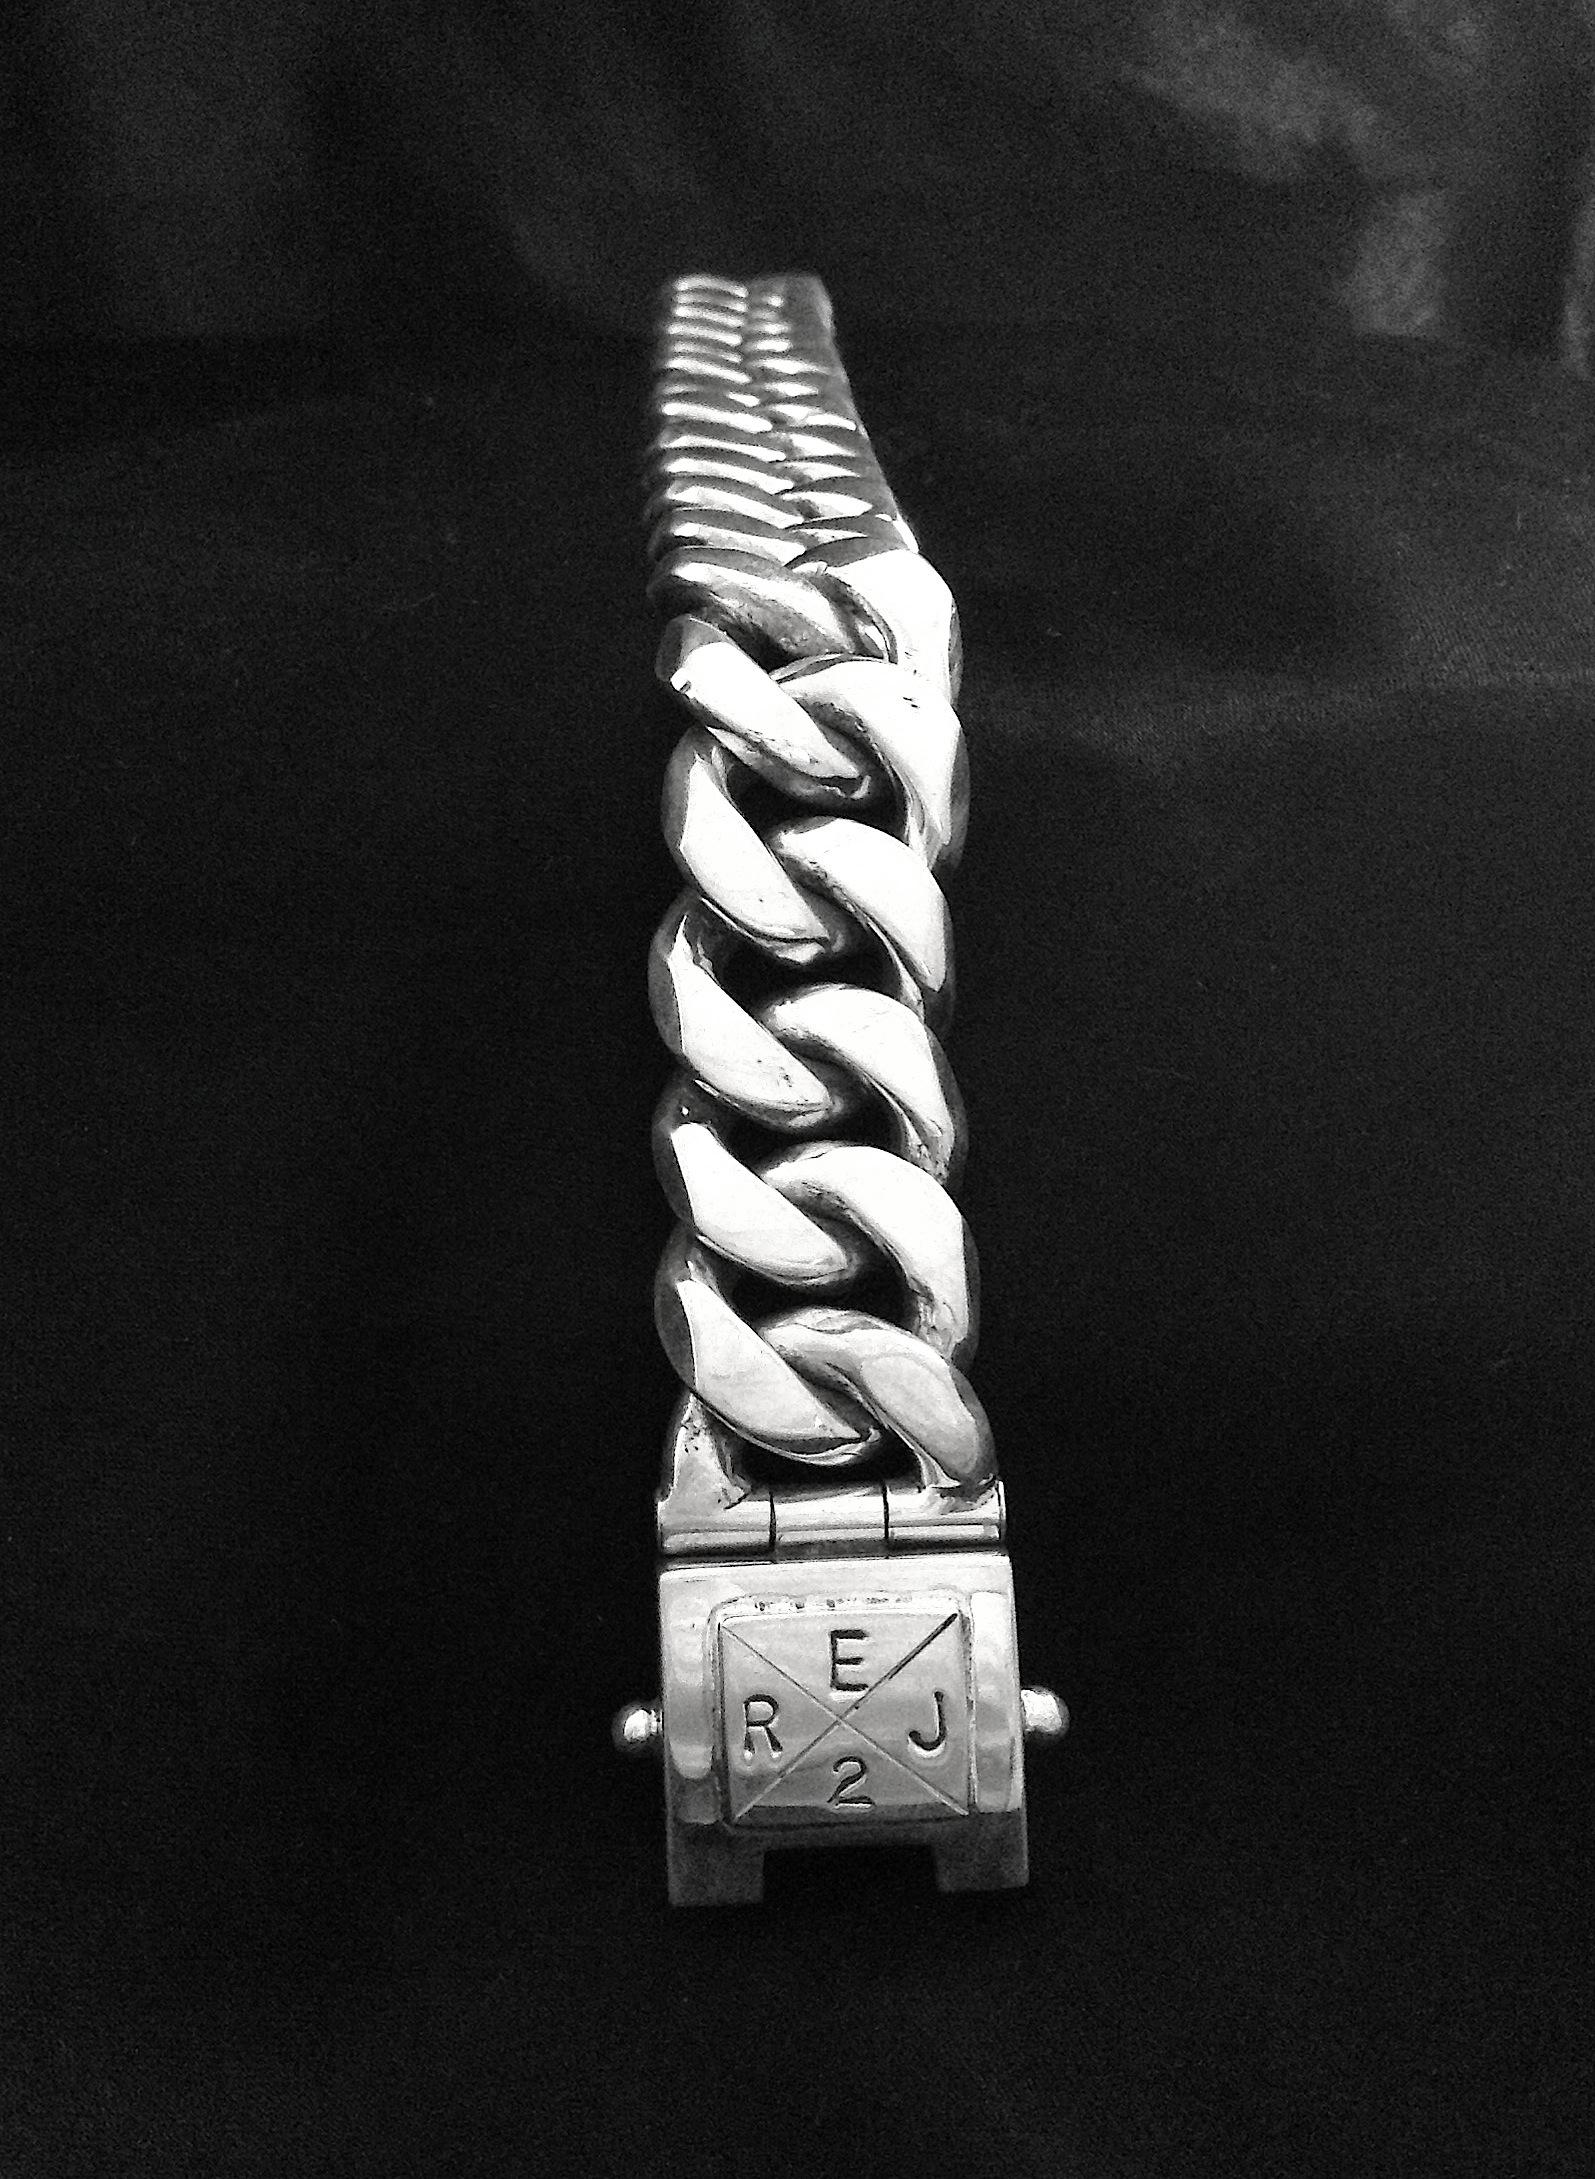 Curb link